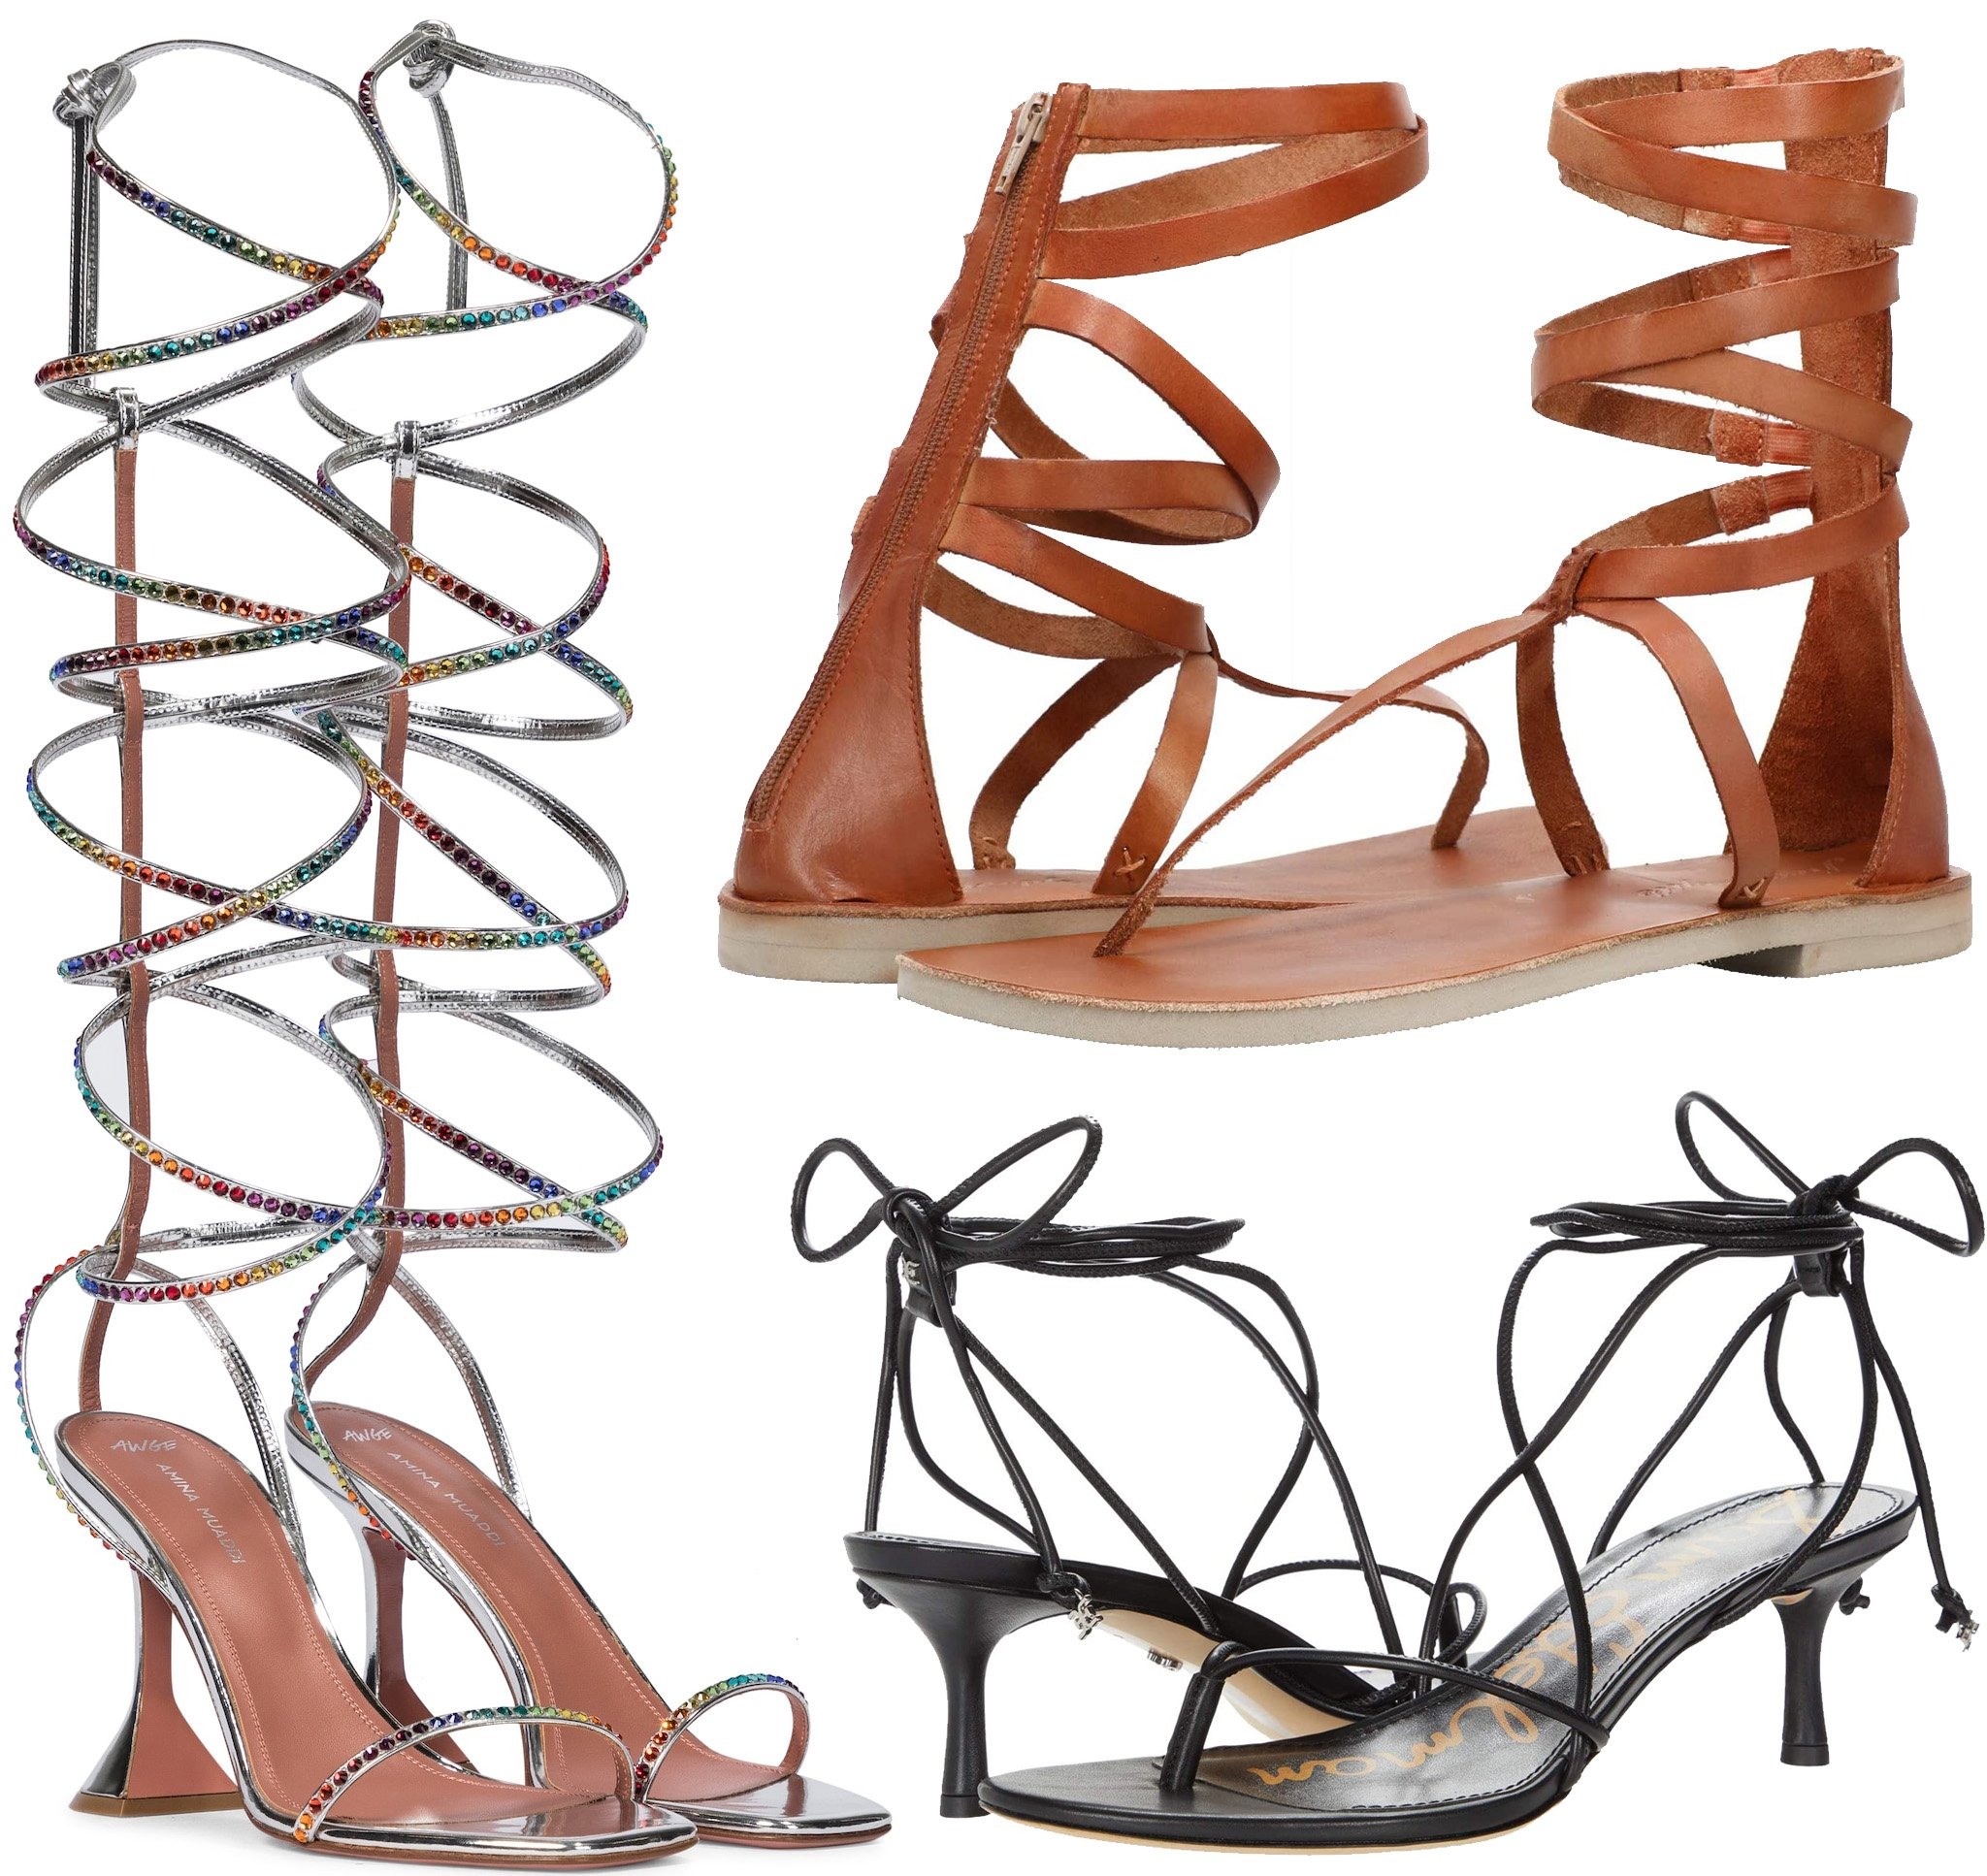 Amina Muaddi x AWGE LSD Embellished Leather Sandals, Free People Anya Gladiator Sandals, Sam Edelman Jamila Sandals